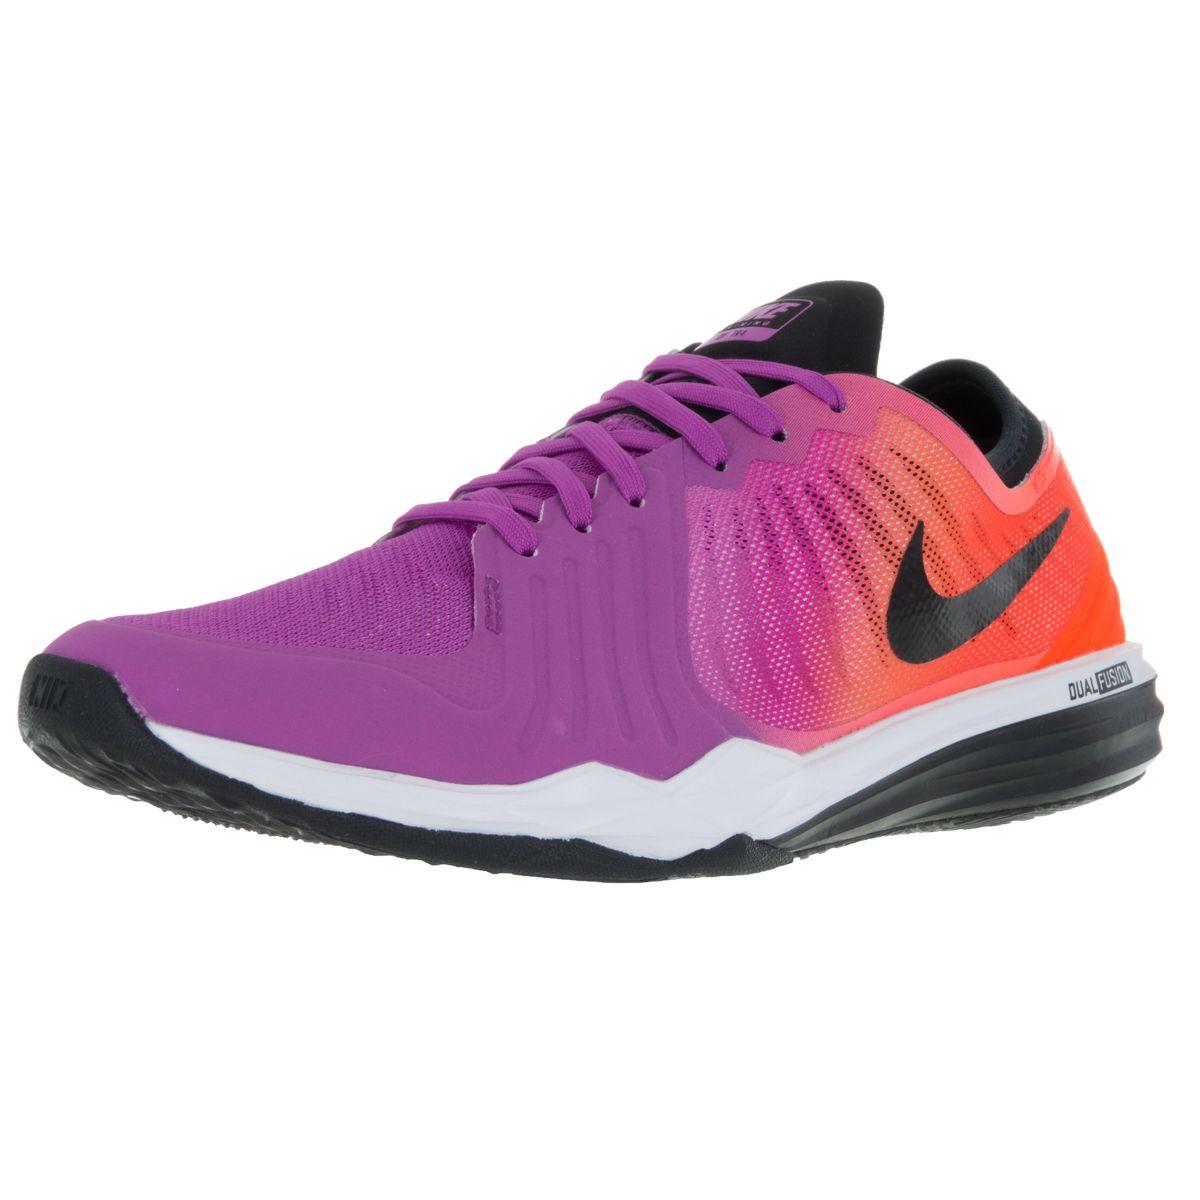 Nike Women's Dual Fusion Tr 4 Print BlackPink Training Shoe